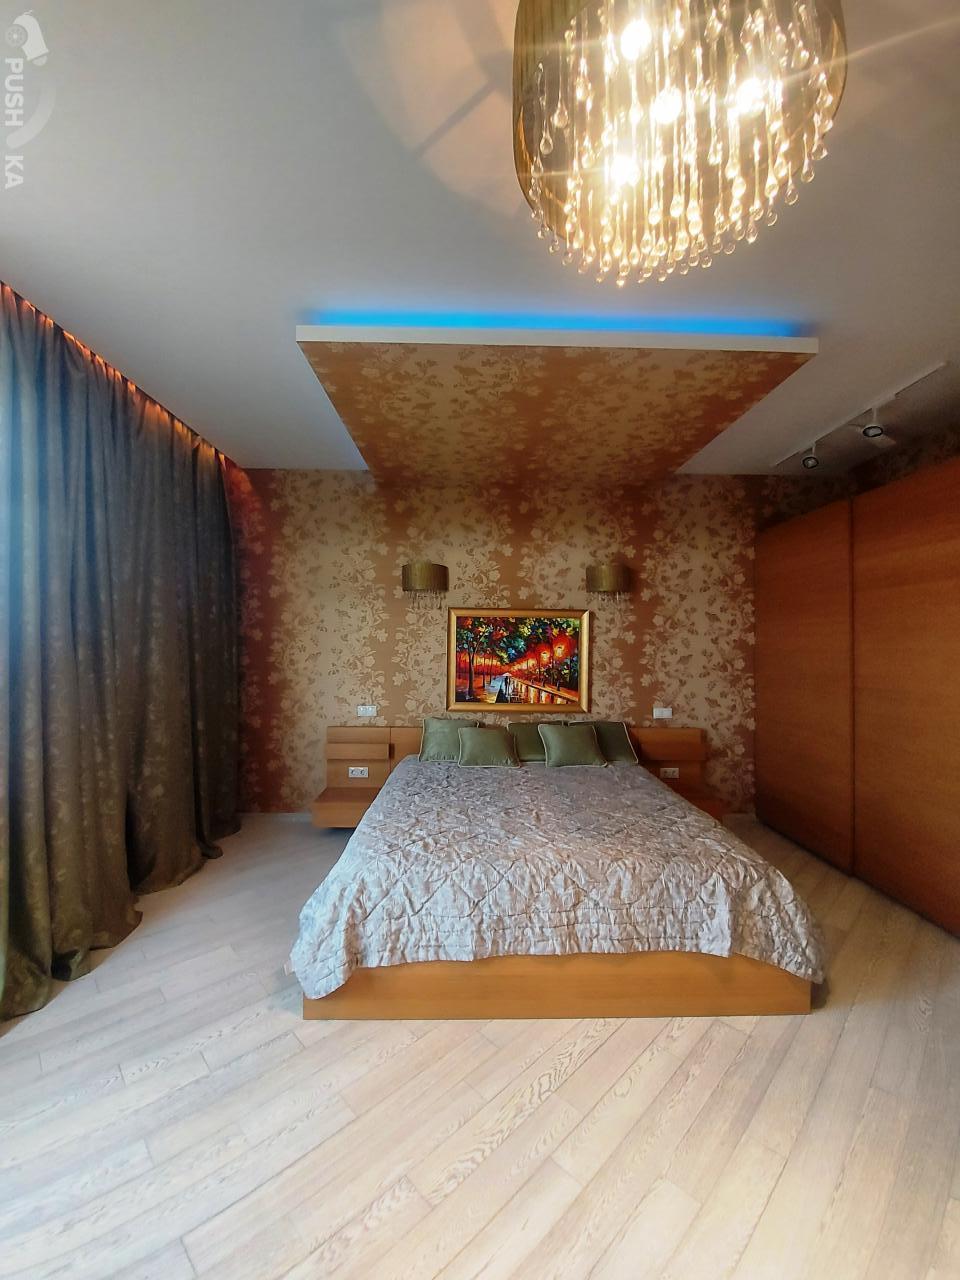 Сдаётся 4-комнатная квартира 195.0 кв.м. этаж 8/12 за 200 000 руб